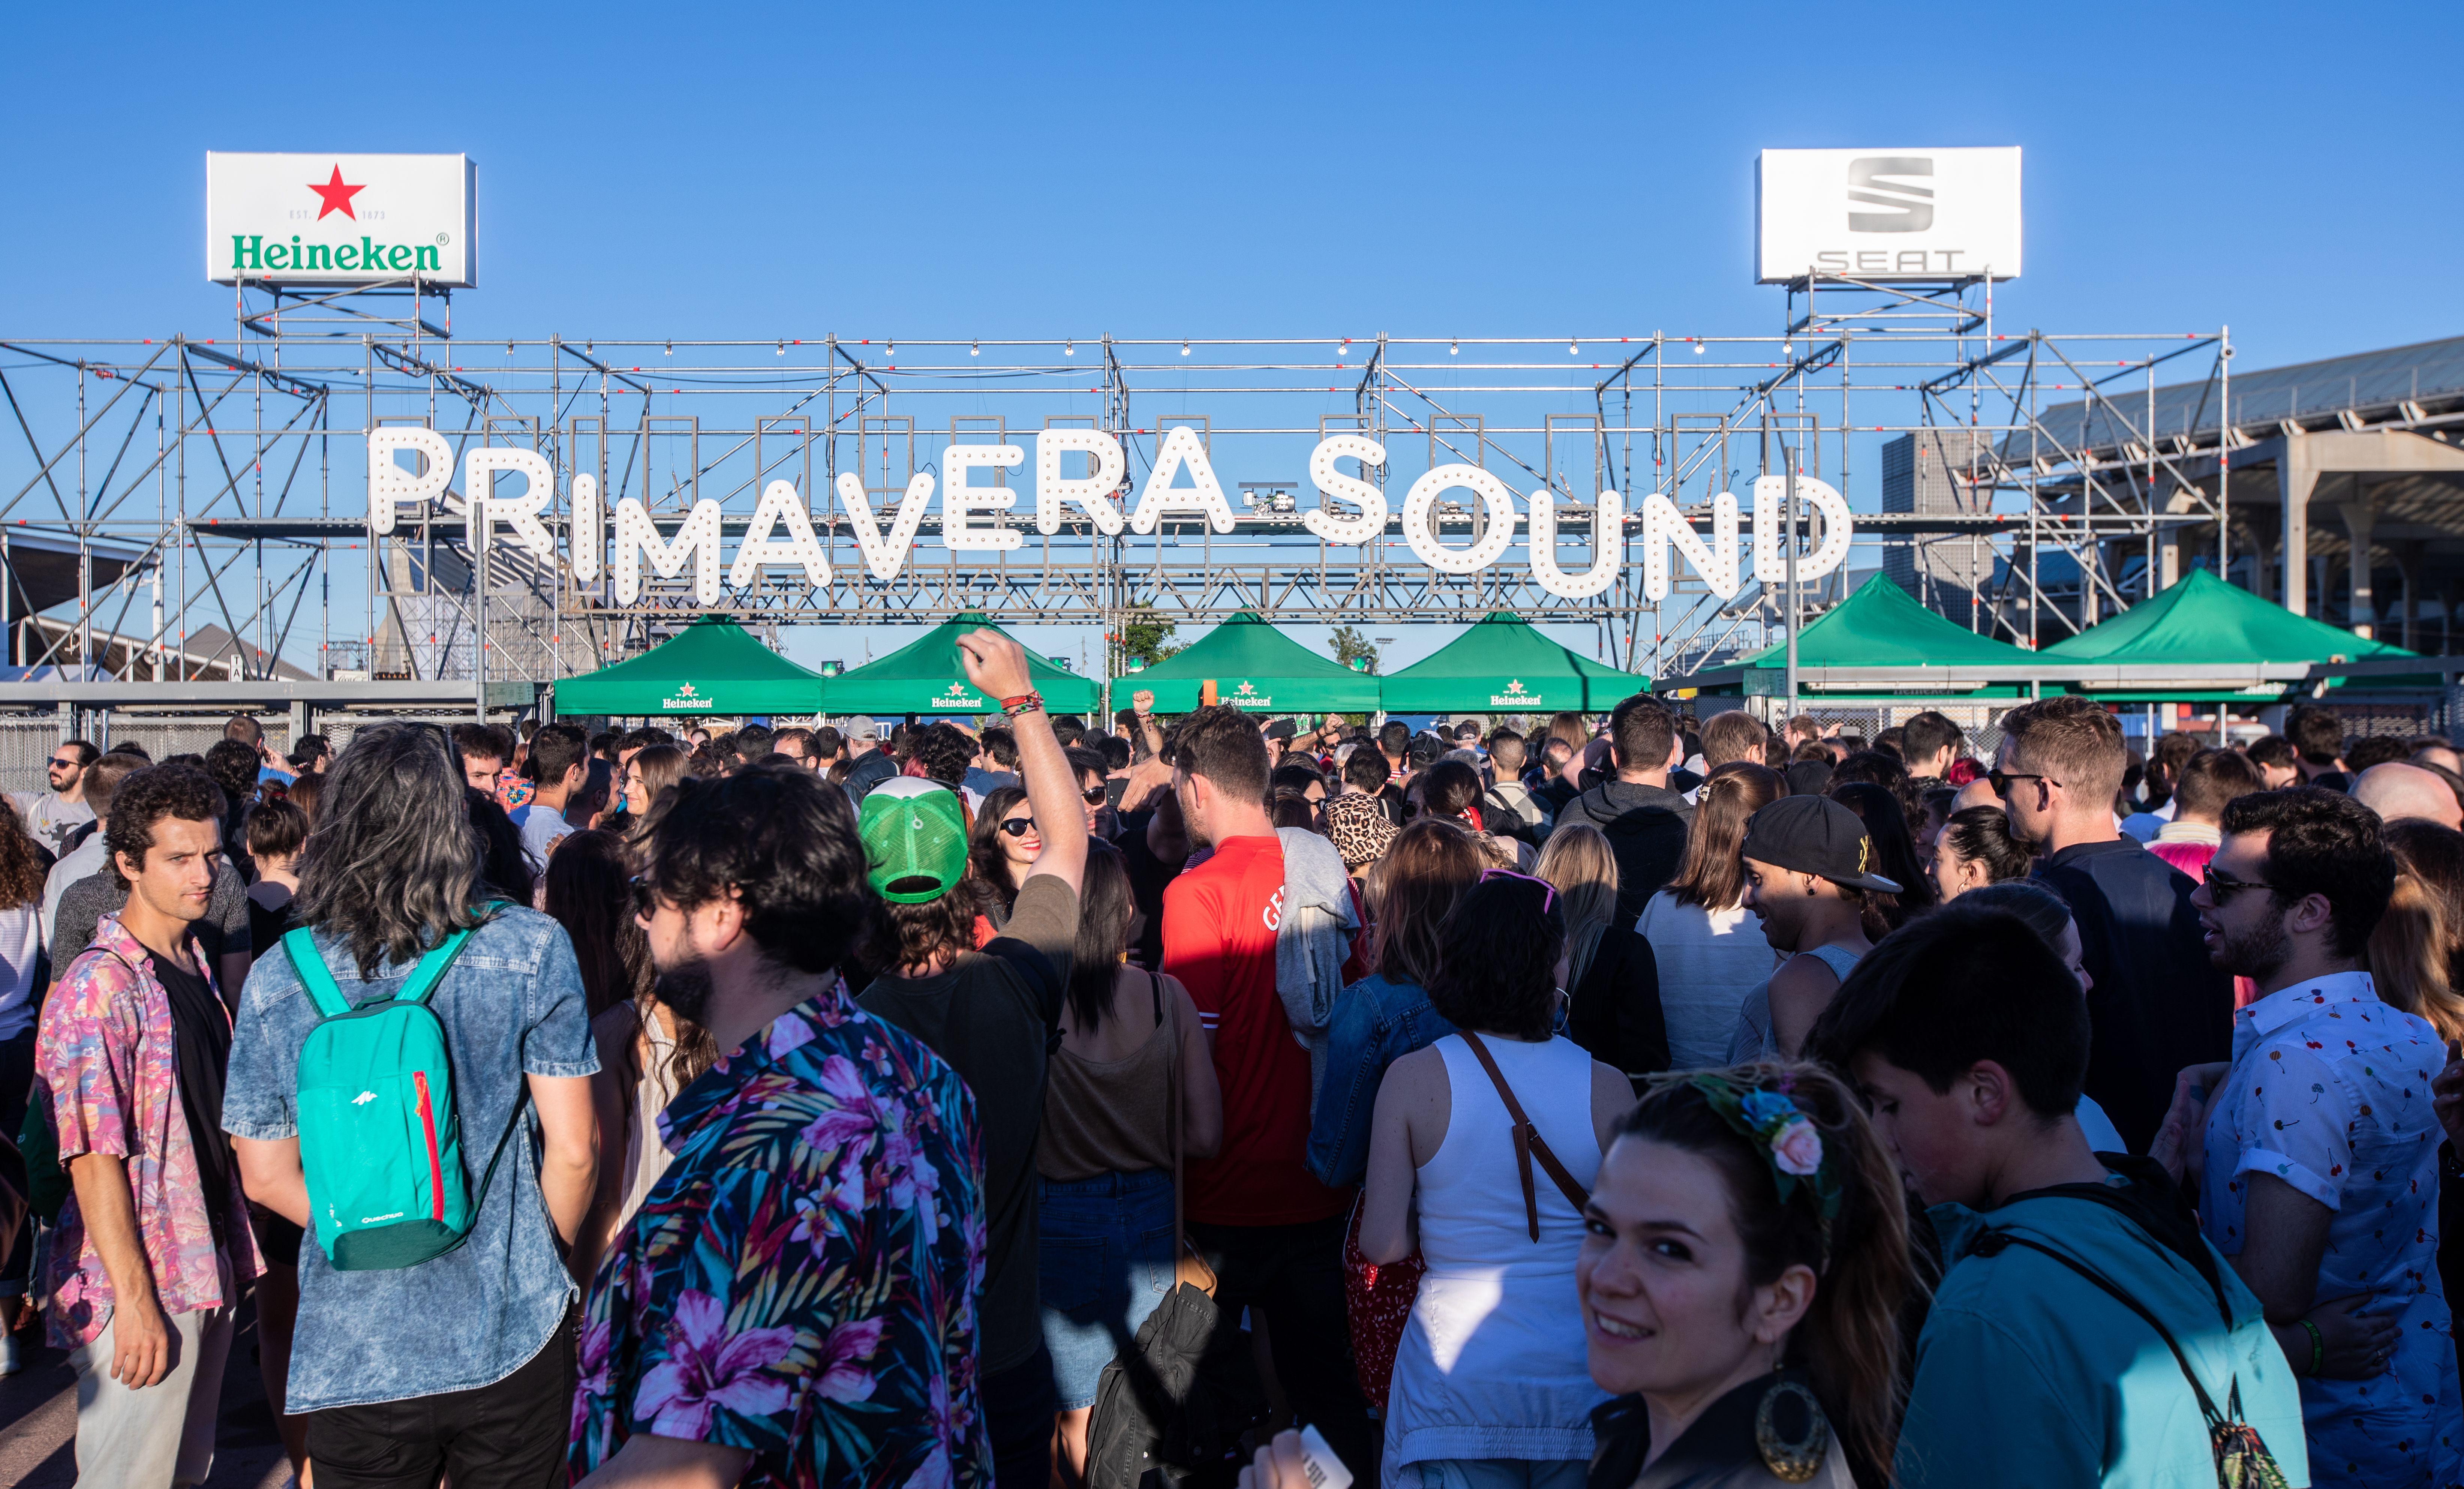 Primavera Sound 2020 Postponed to August Due to Coronavirus Concerns